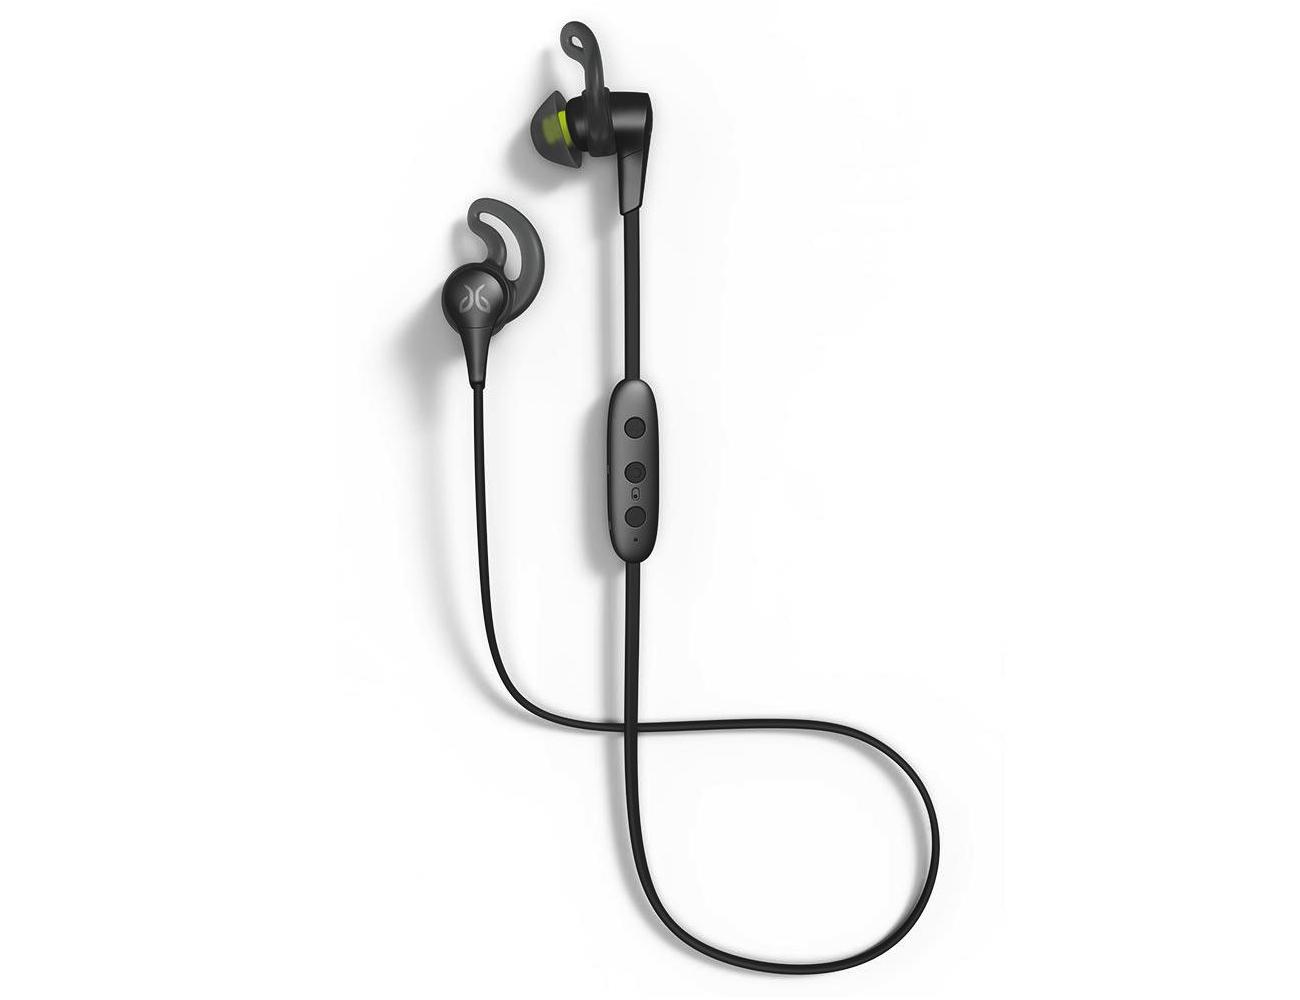 Jaybird X4 Wireless Sport Headphones